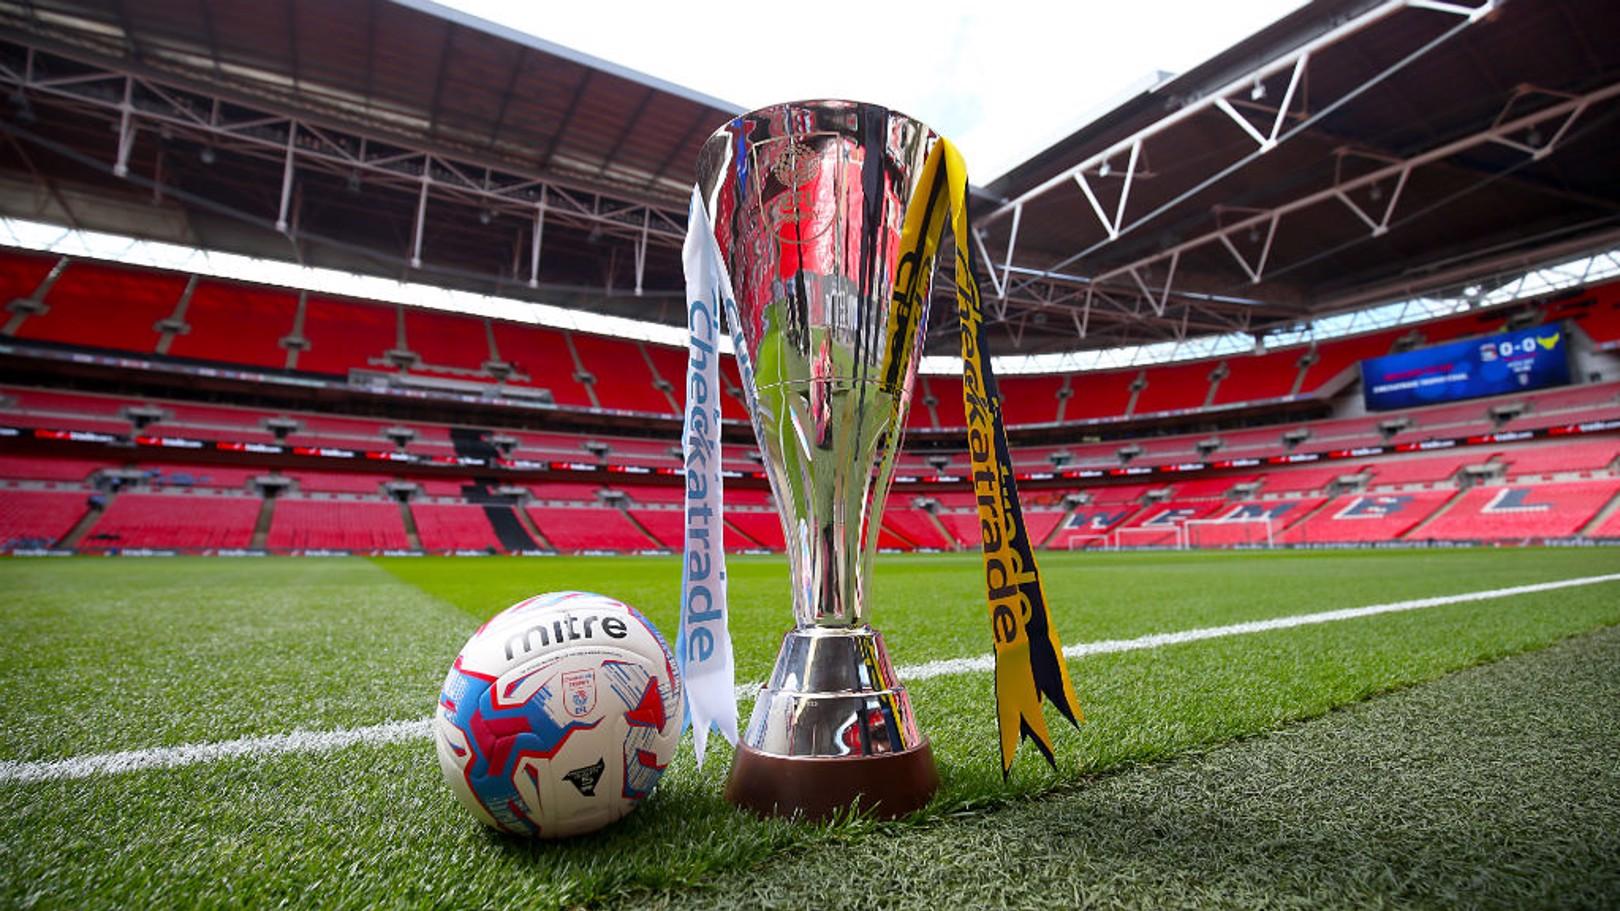 CHECKATRADE: City face Sunderland in the quarter-final